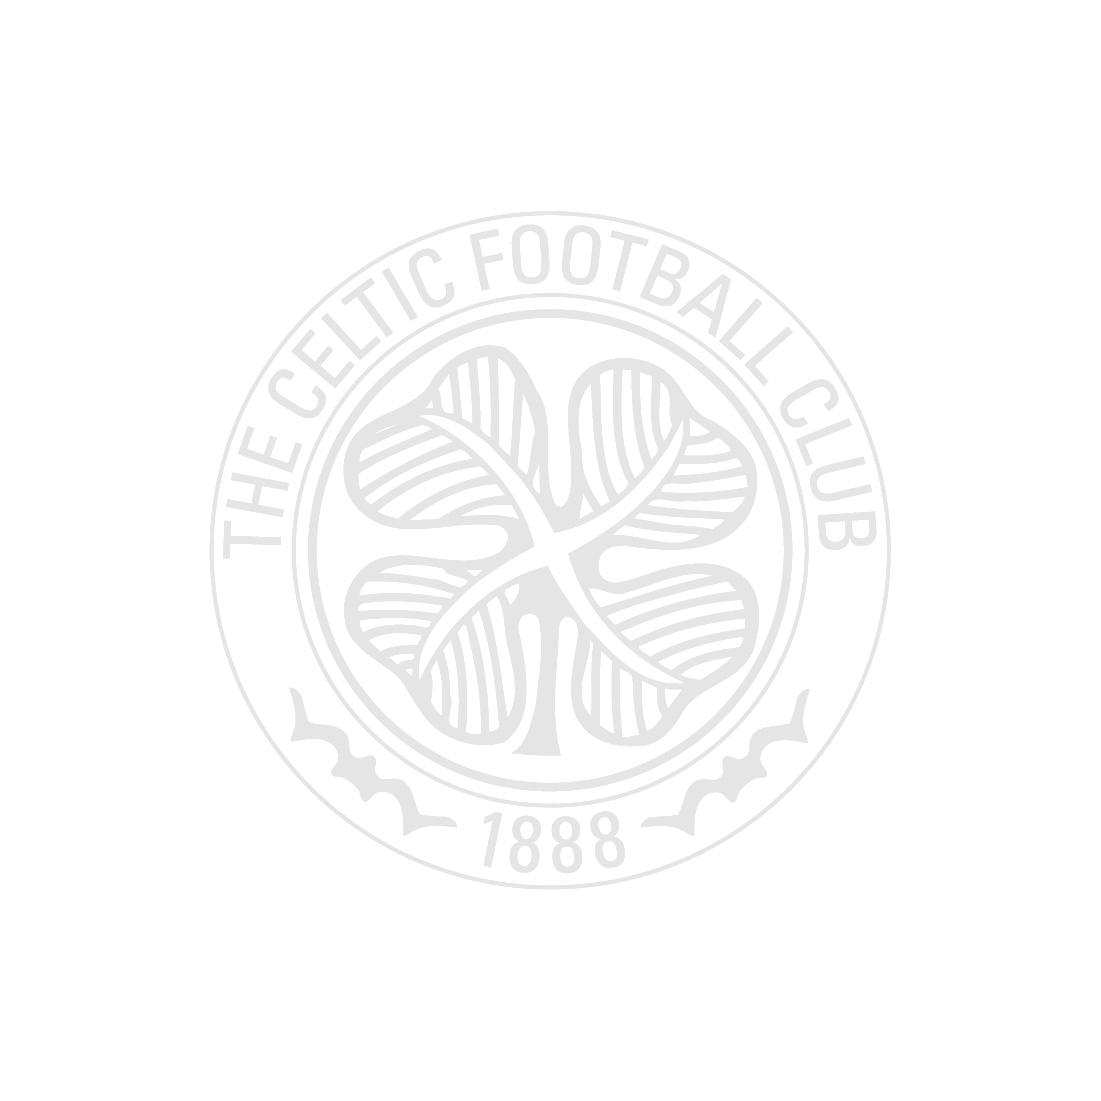 Celtic Double Treble Stainless Steel Cufflinks